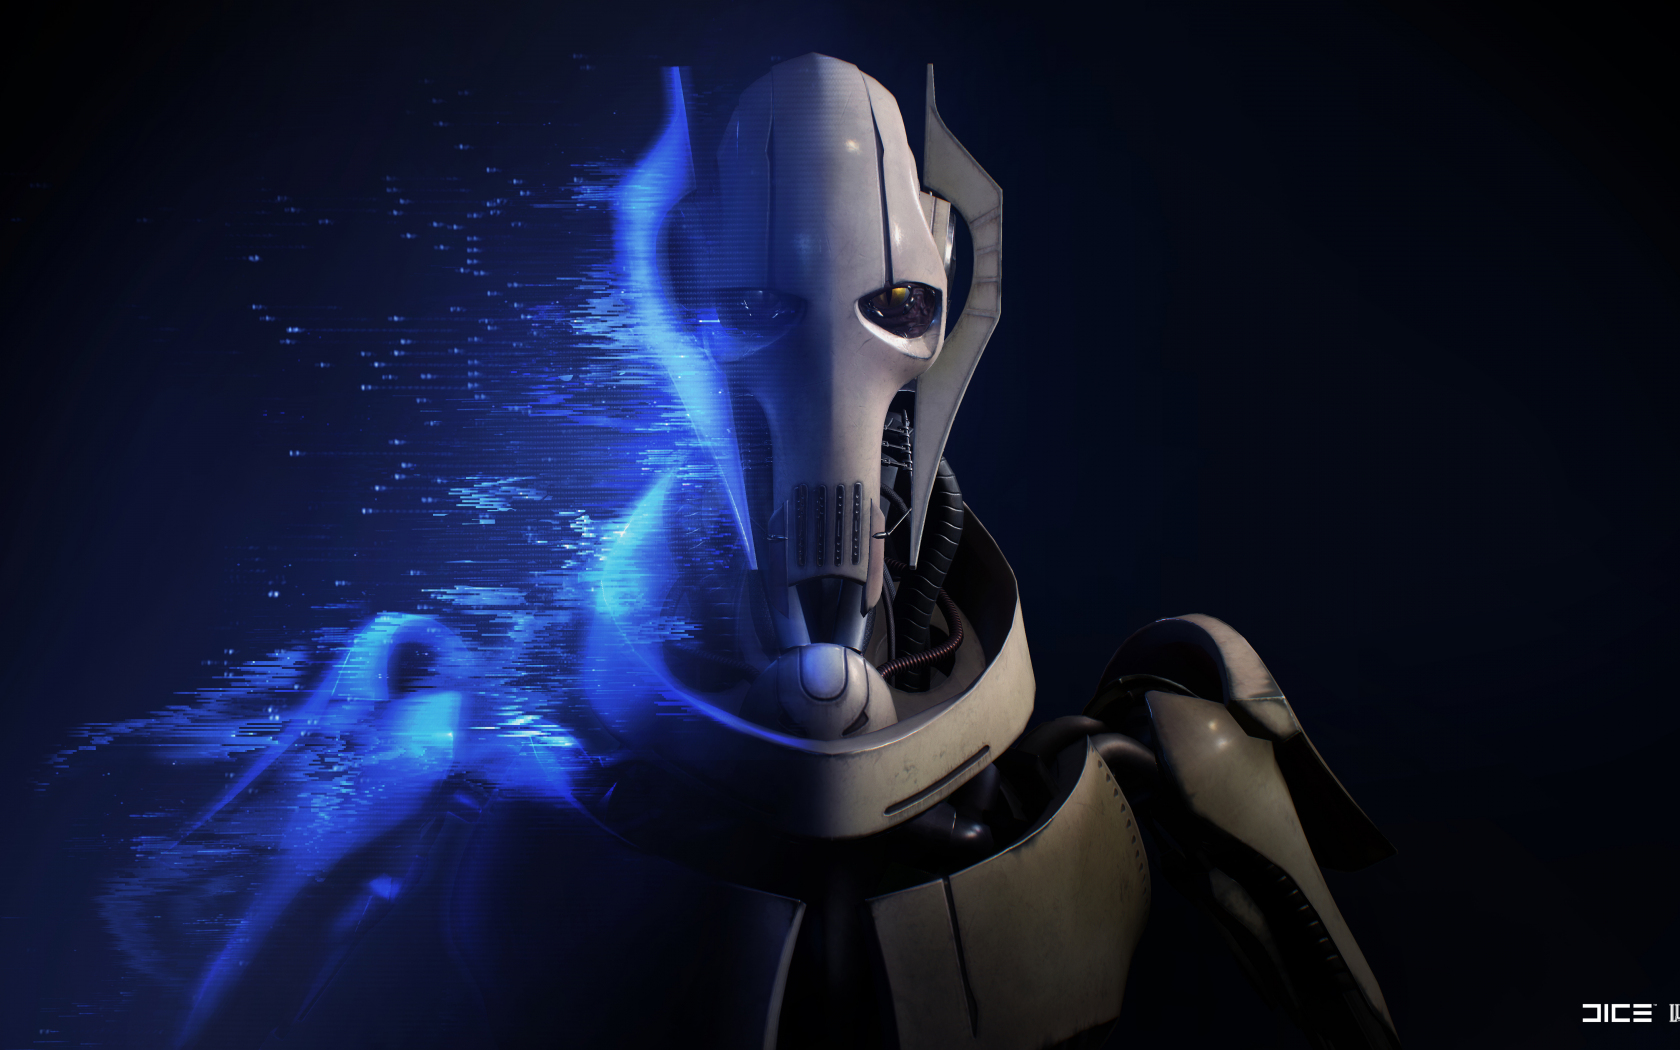 Download 1680x1050 Wallpaper Star Wars Battlefront Ii General Grievous Video Game Art Widescreen 16 10 Widescreen 1680x1050 Hd Image Background 10357